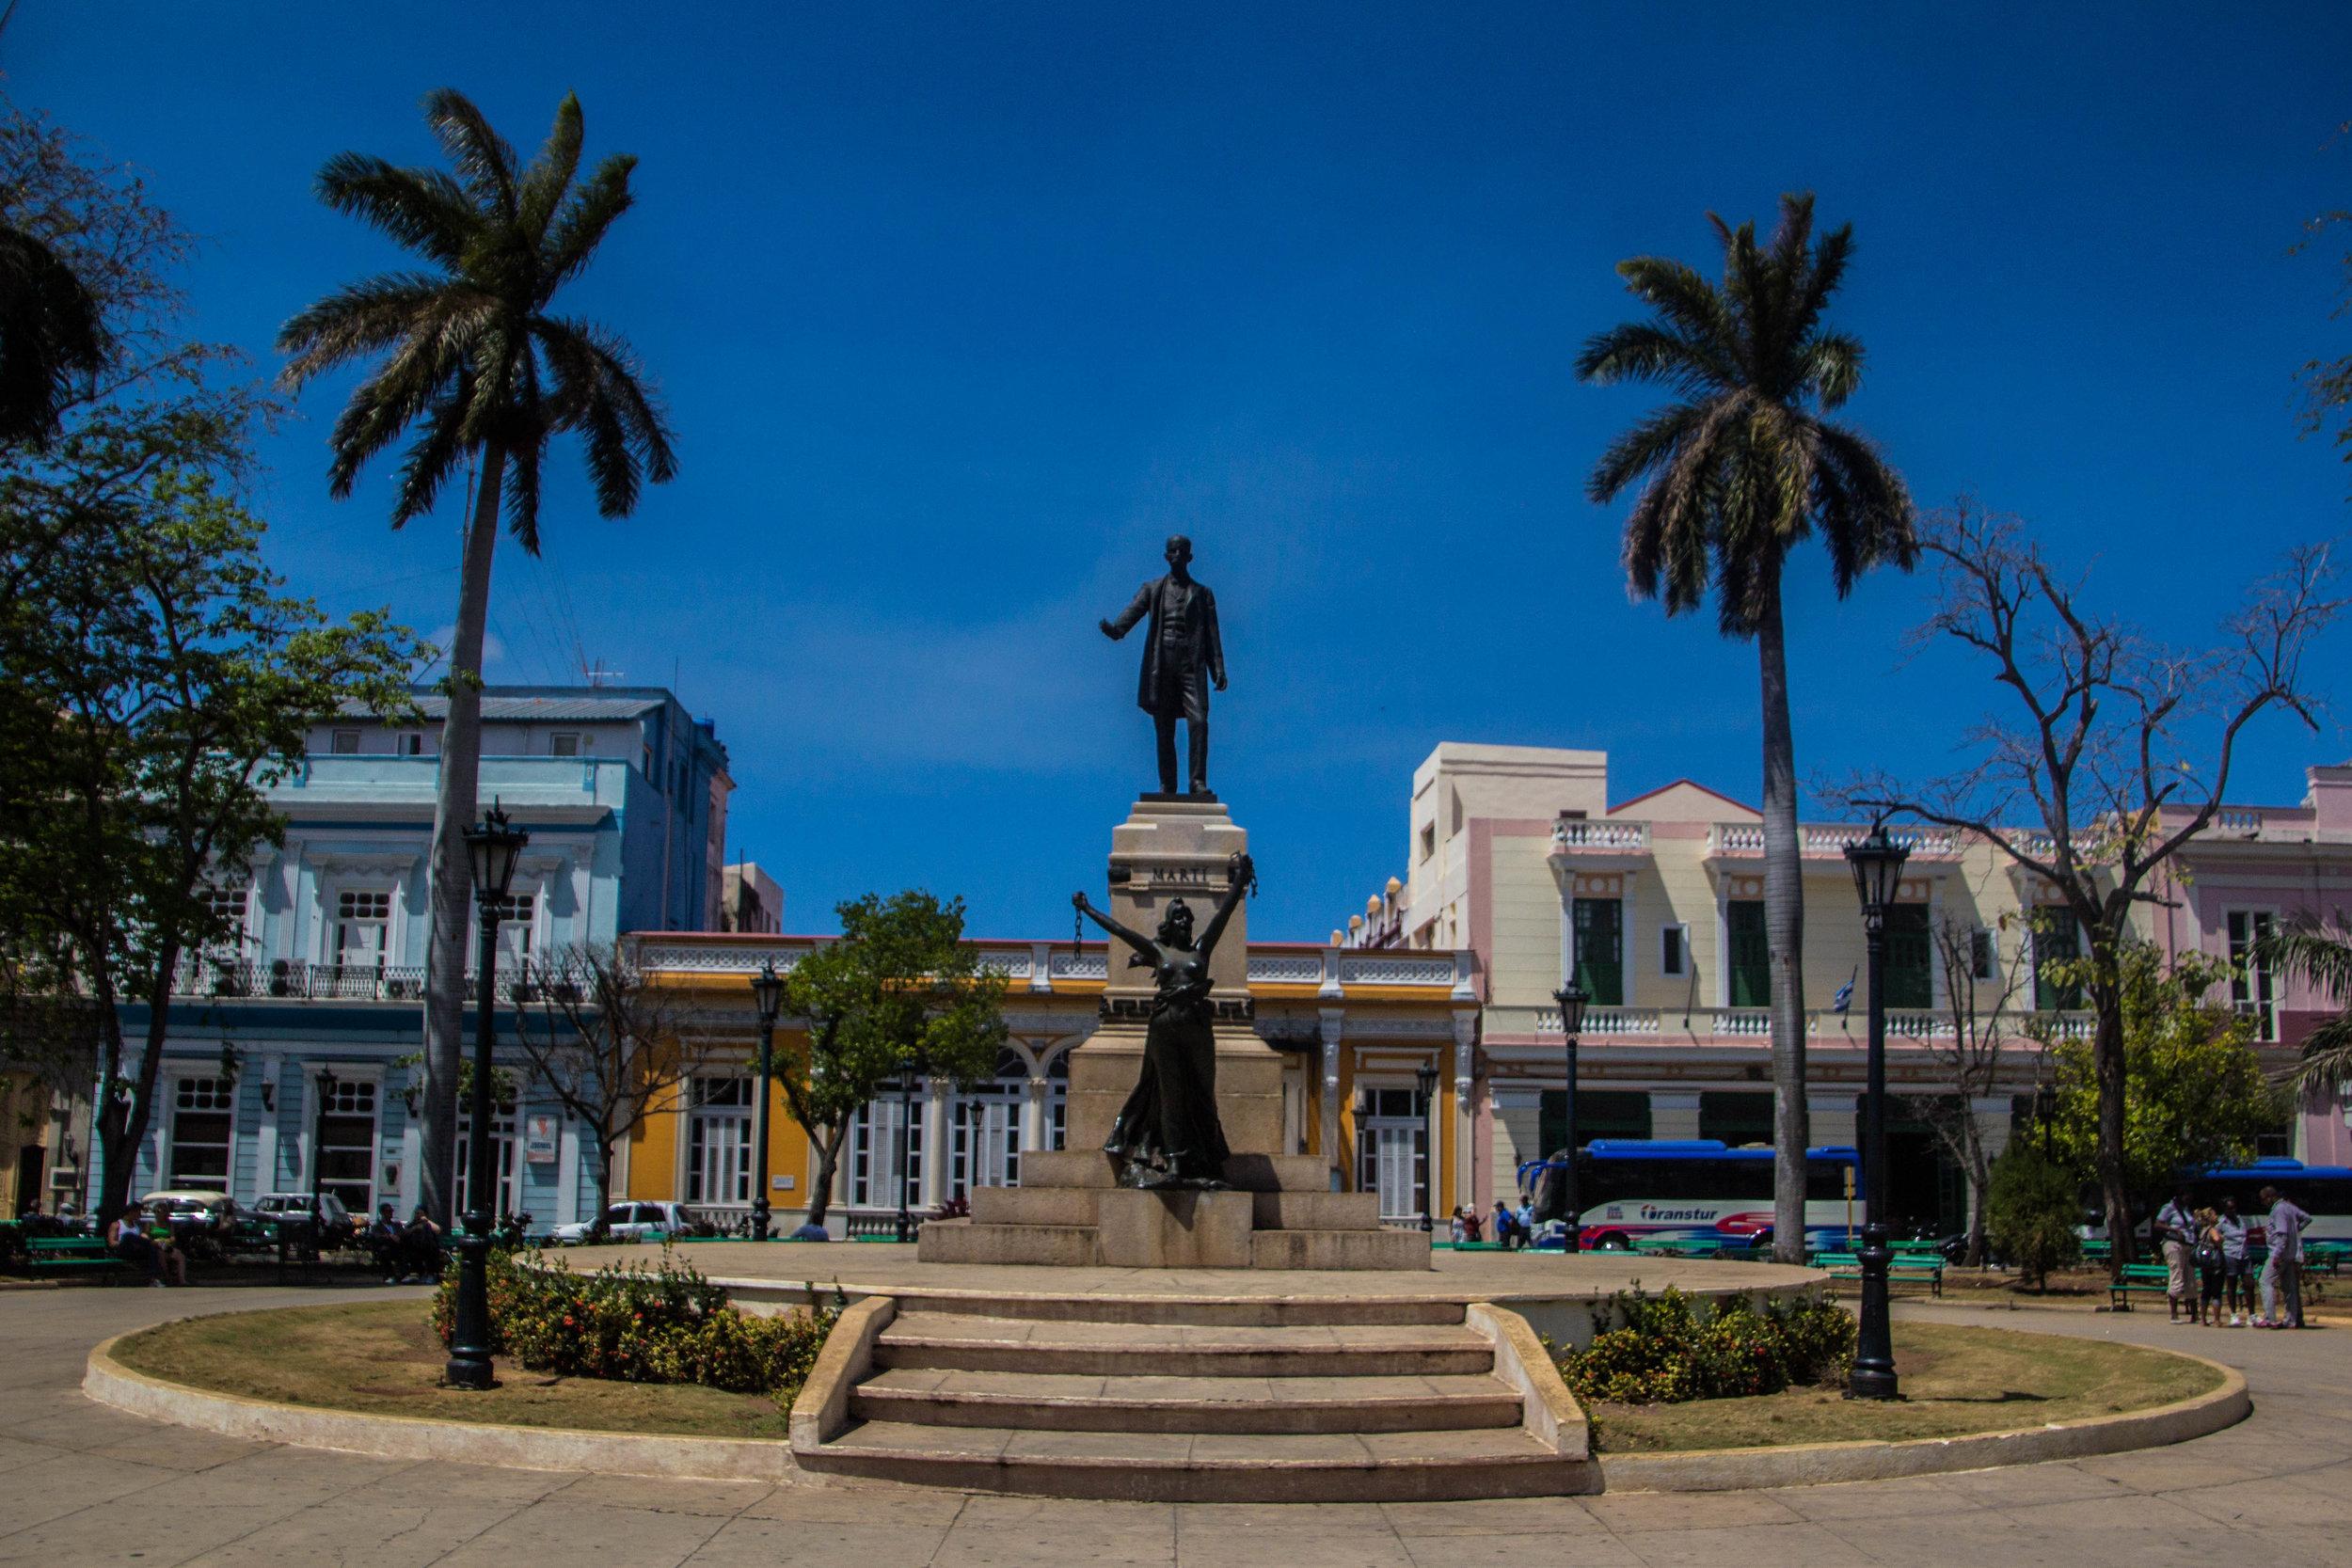 matanzas cuba city square-1 copy-2.jpg